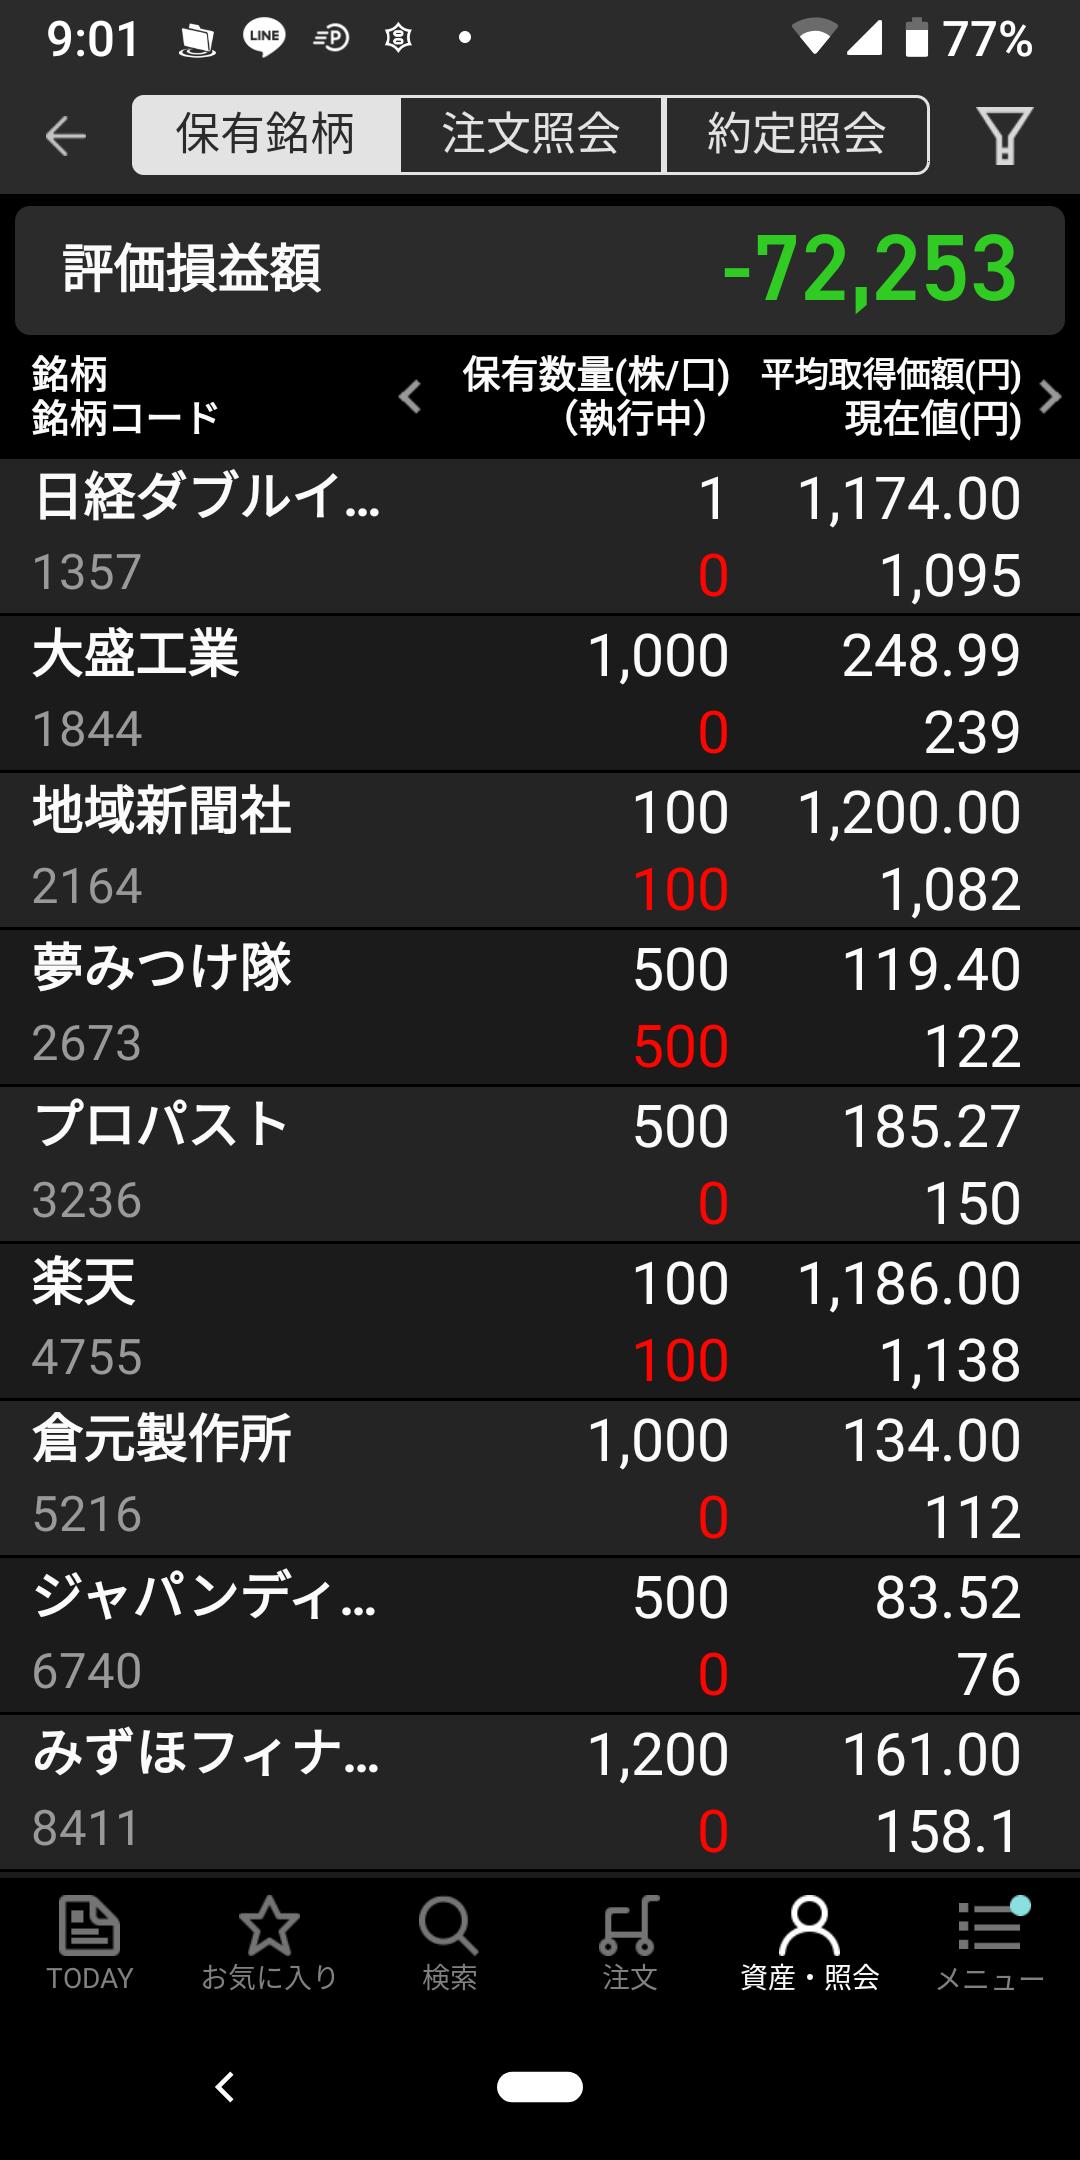 Screenshot (2019_07_25 9_01_58)